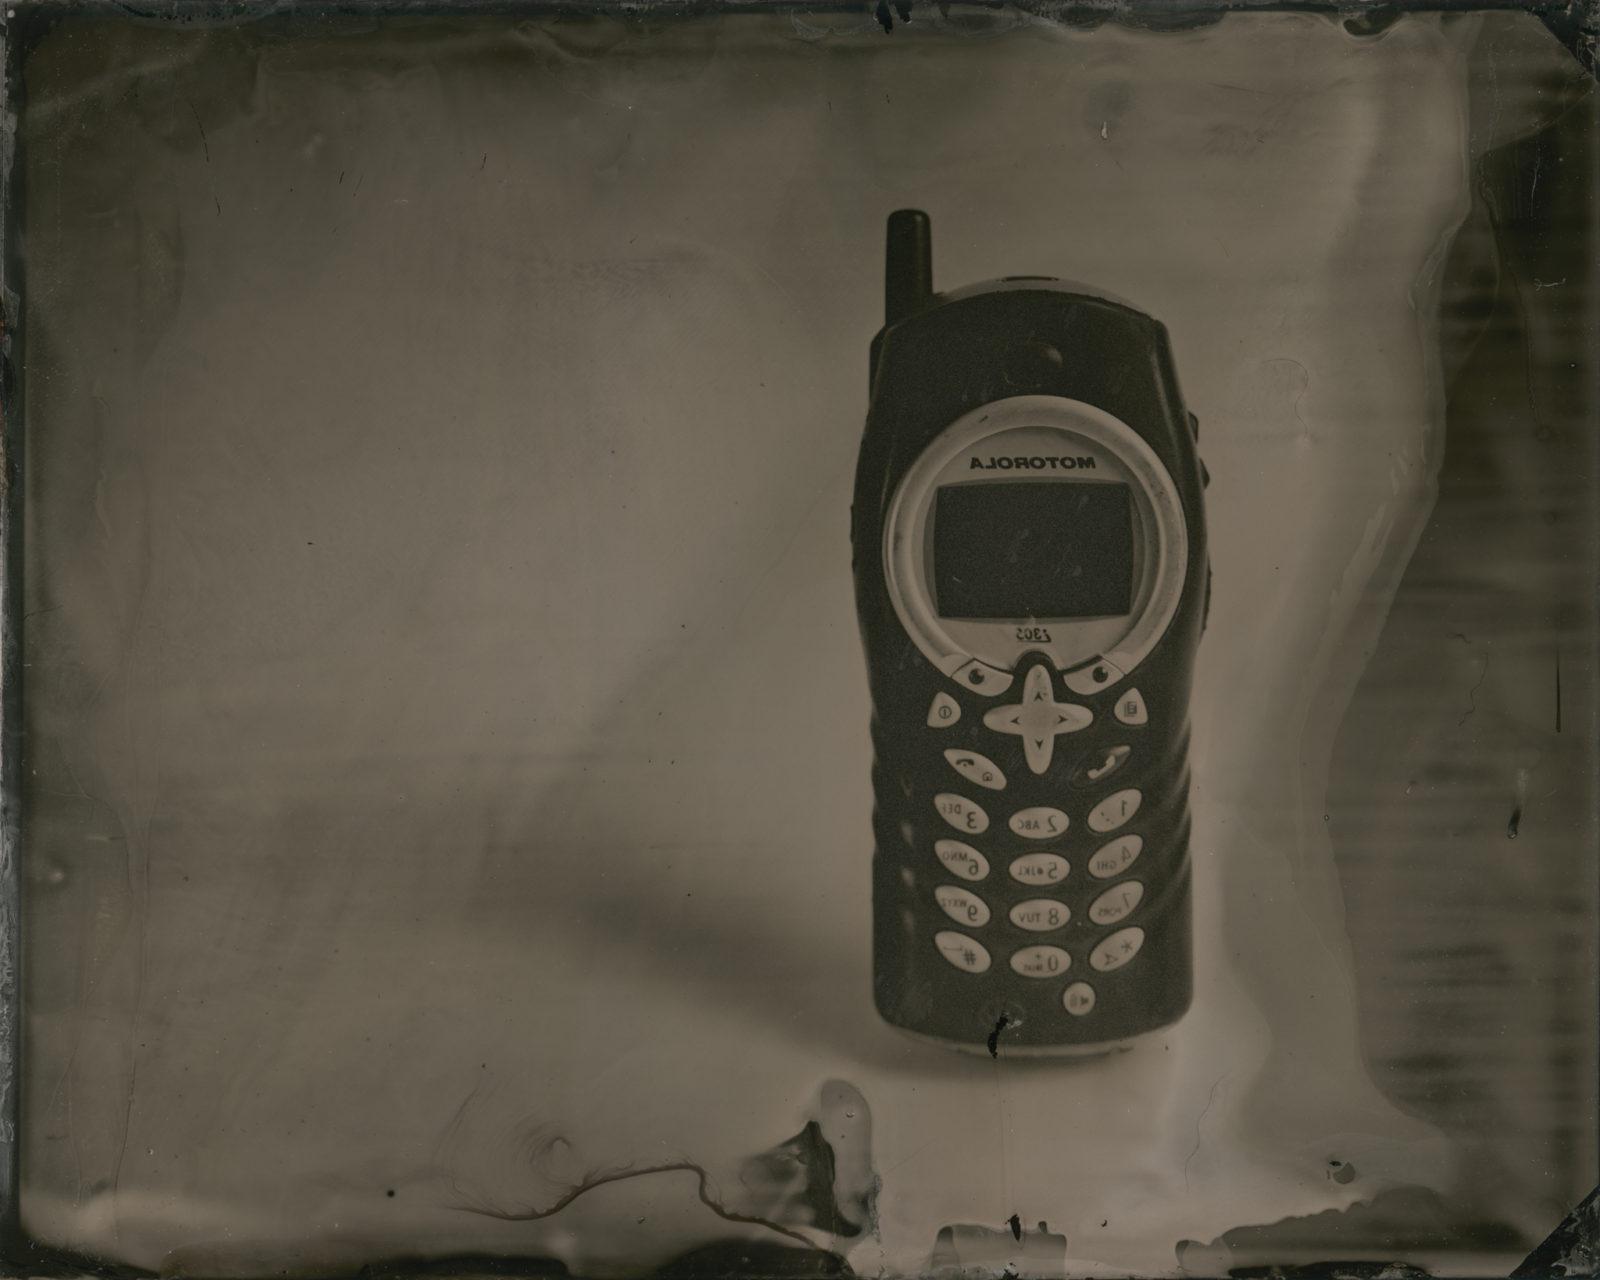 Phone Portrait 6, 2017